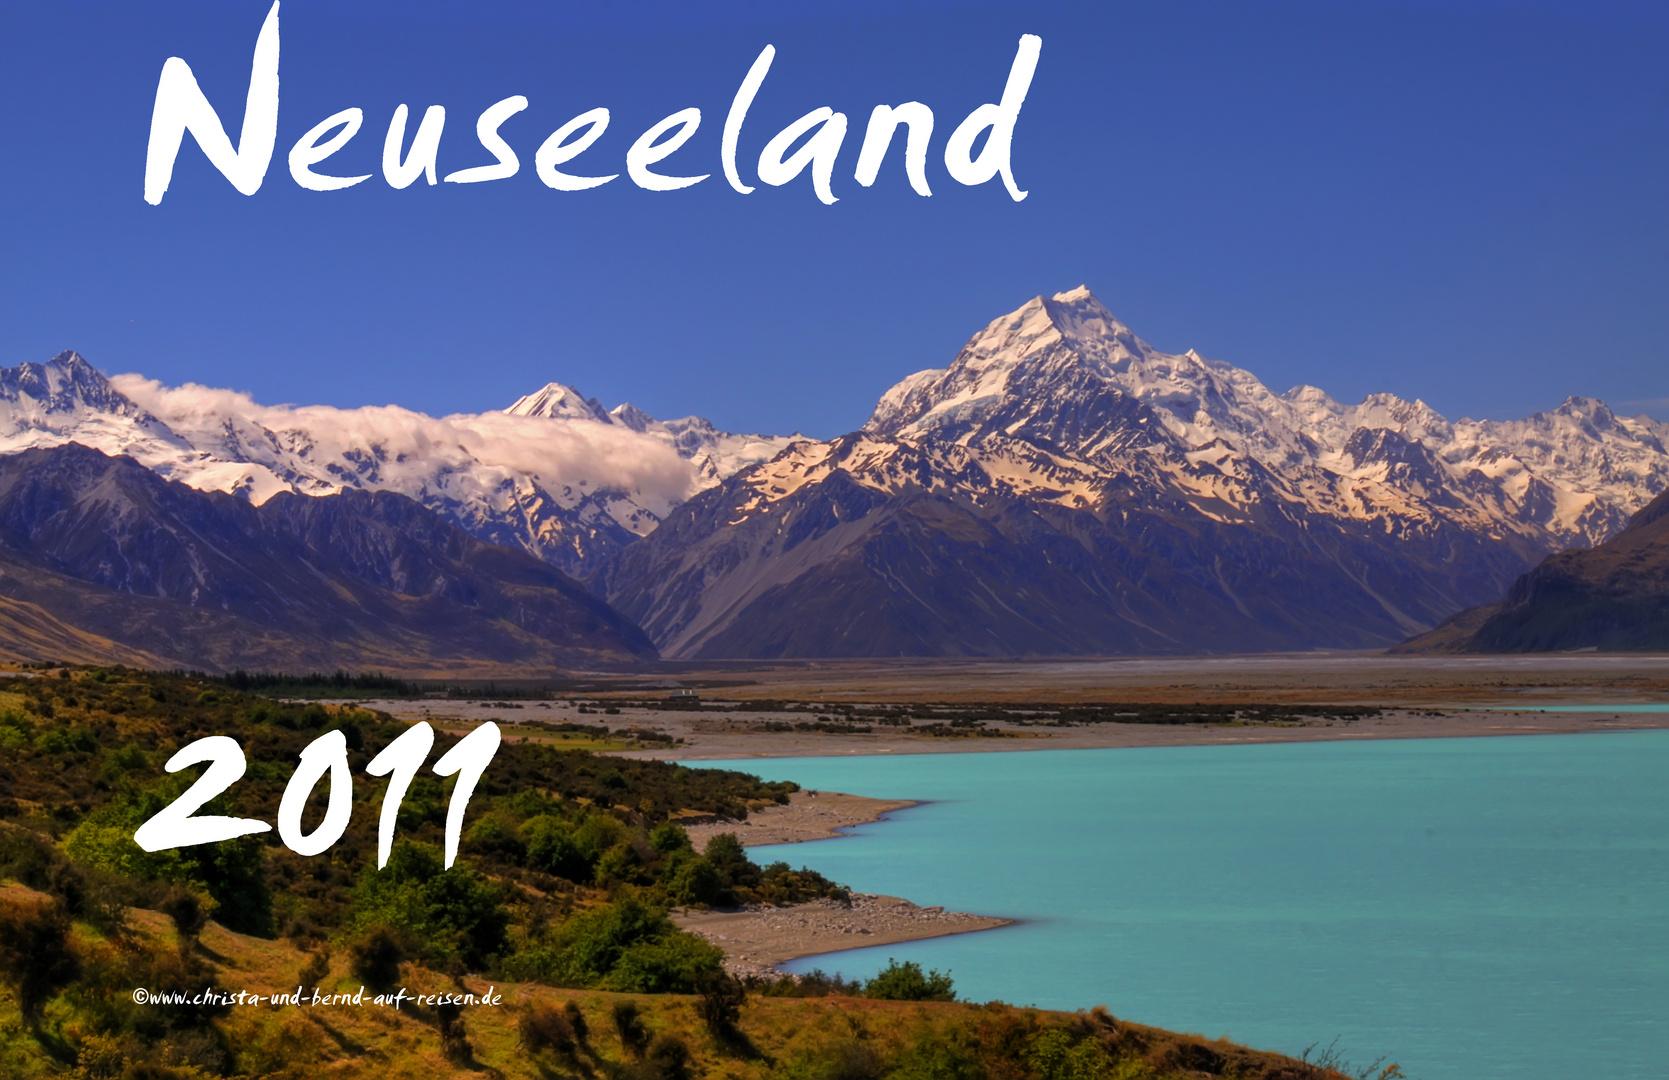 Neuseeland als Kalender 2011 (2)